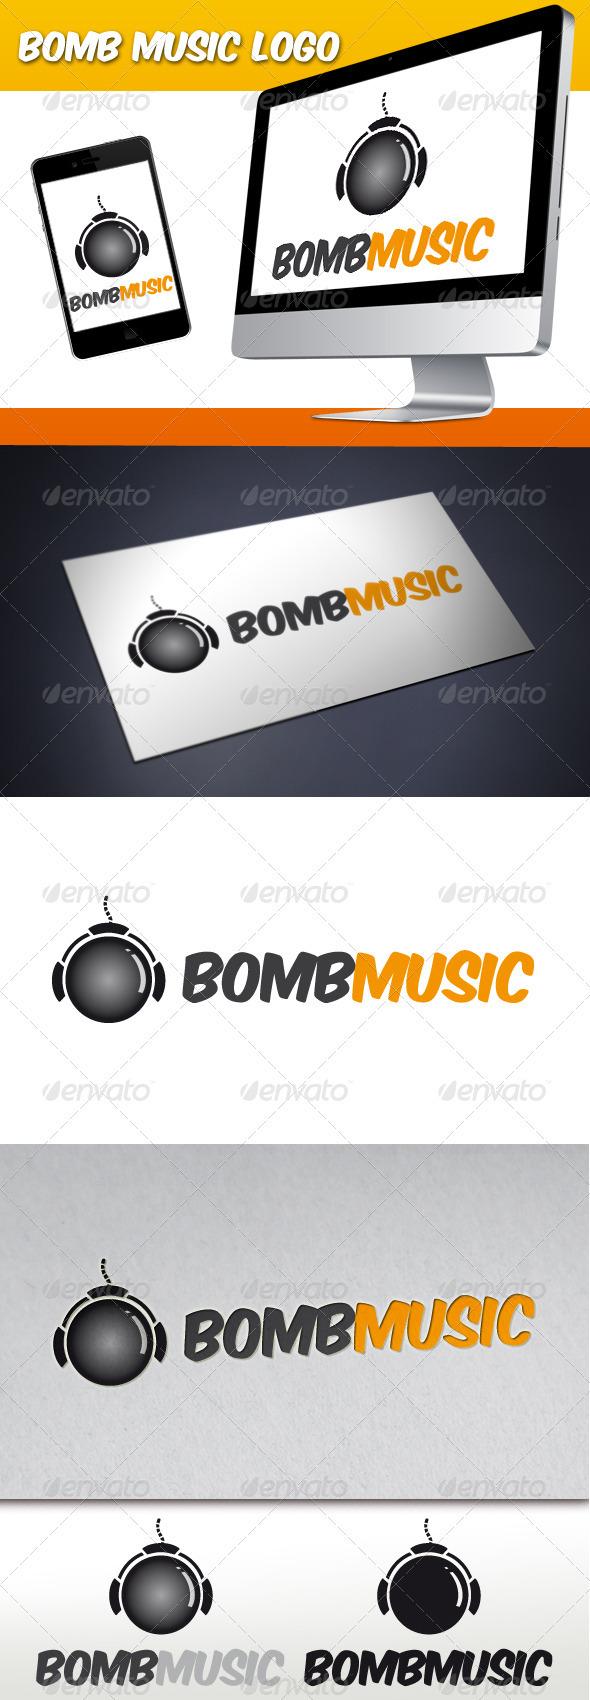 Bomb Music Logo - Objects Logo Templates